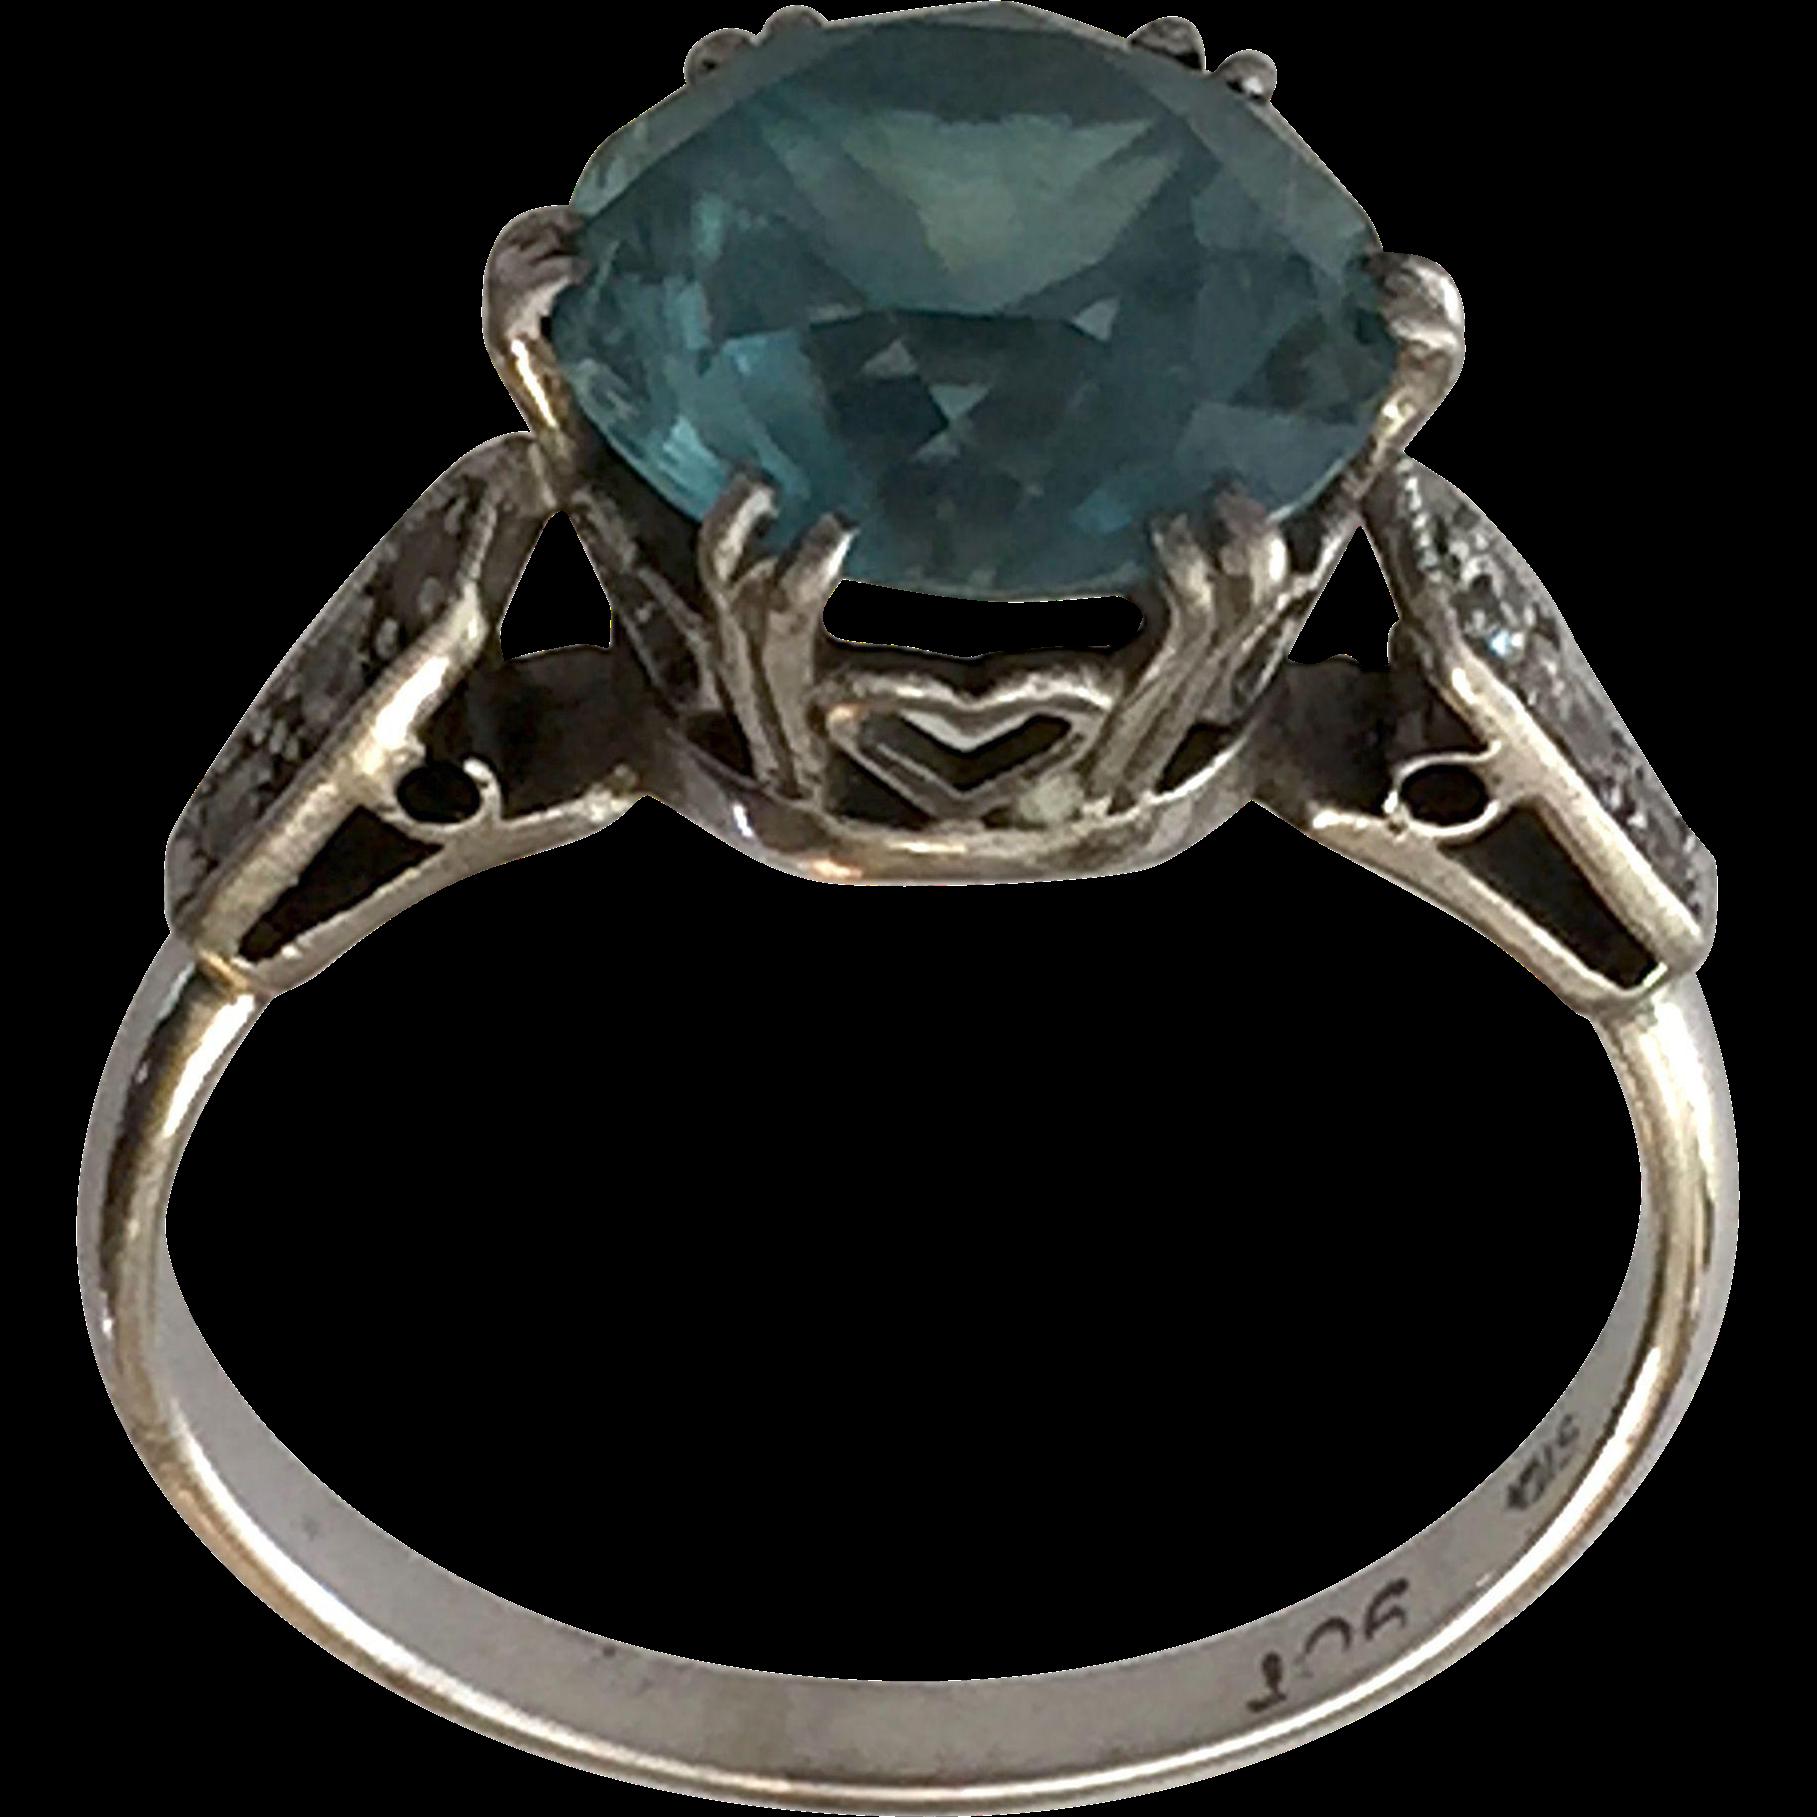 blue zircon white gold ring sz 8 diamonds from